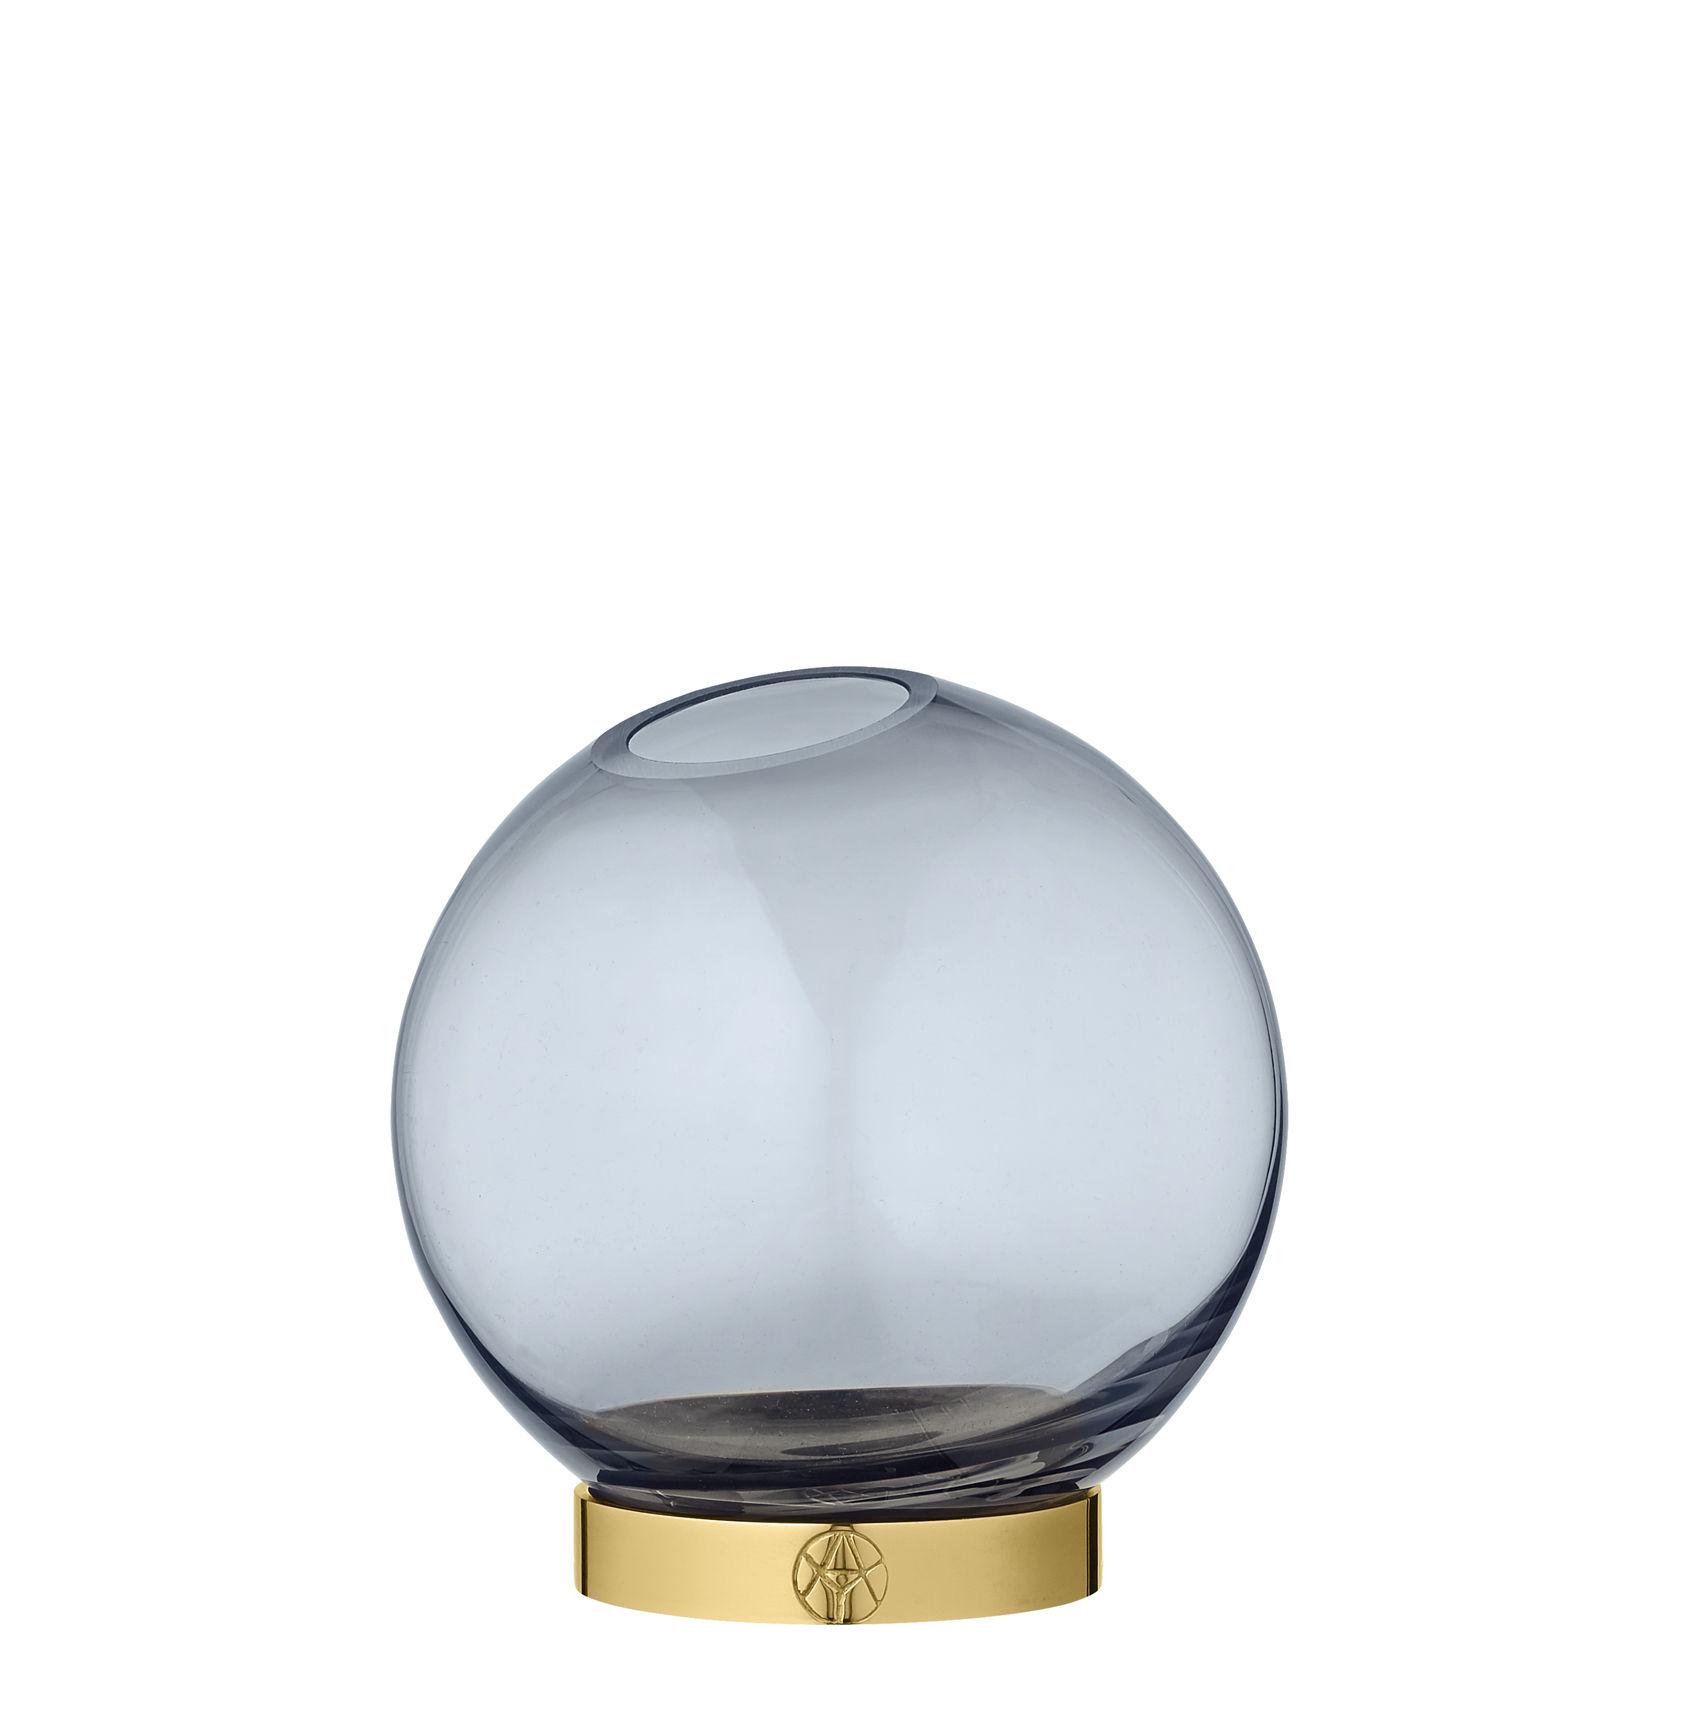 Decoration - Vases - Globe Small Vase - / Ø 10 cm - Glass & brass by AYTM - Ø 10 cm / Blue & brass - Blown glass, Brass